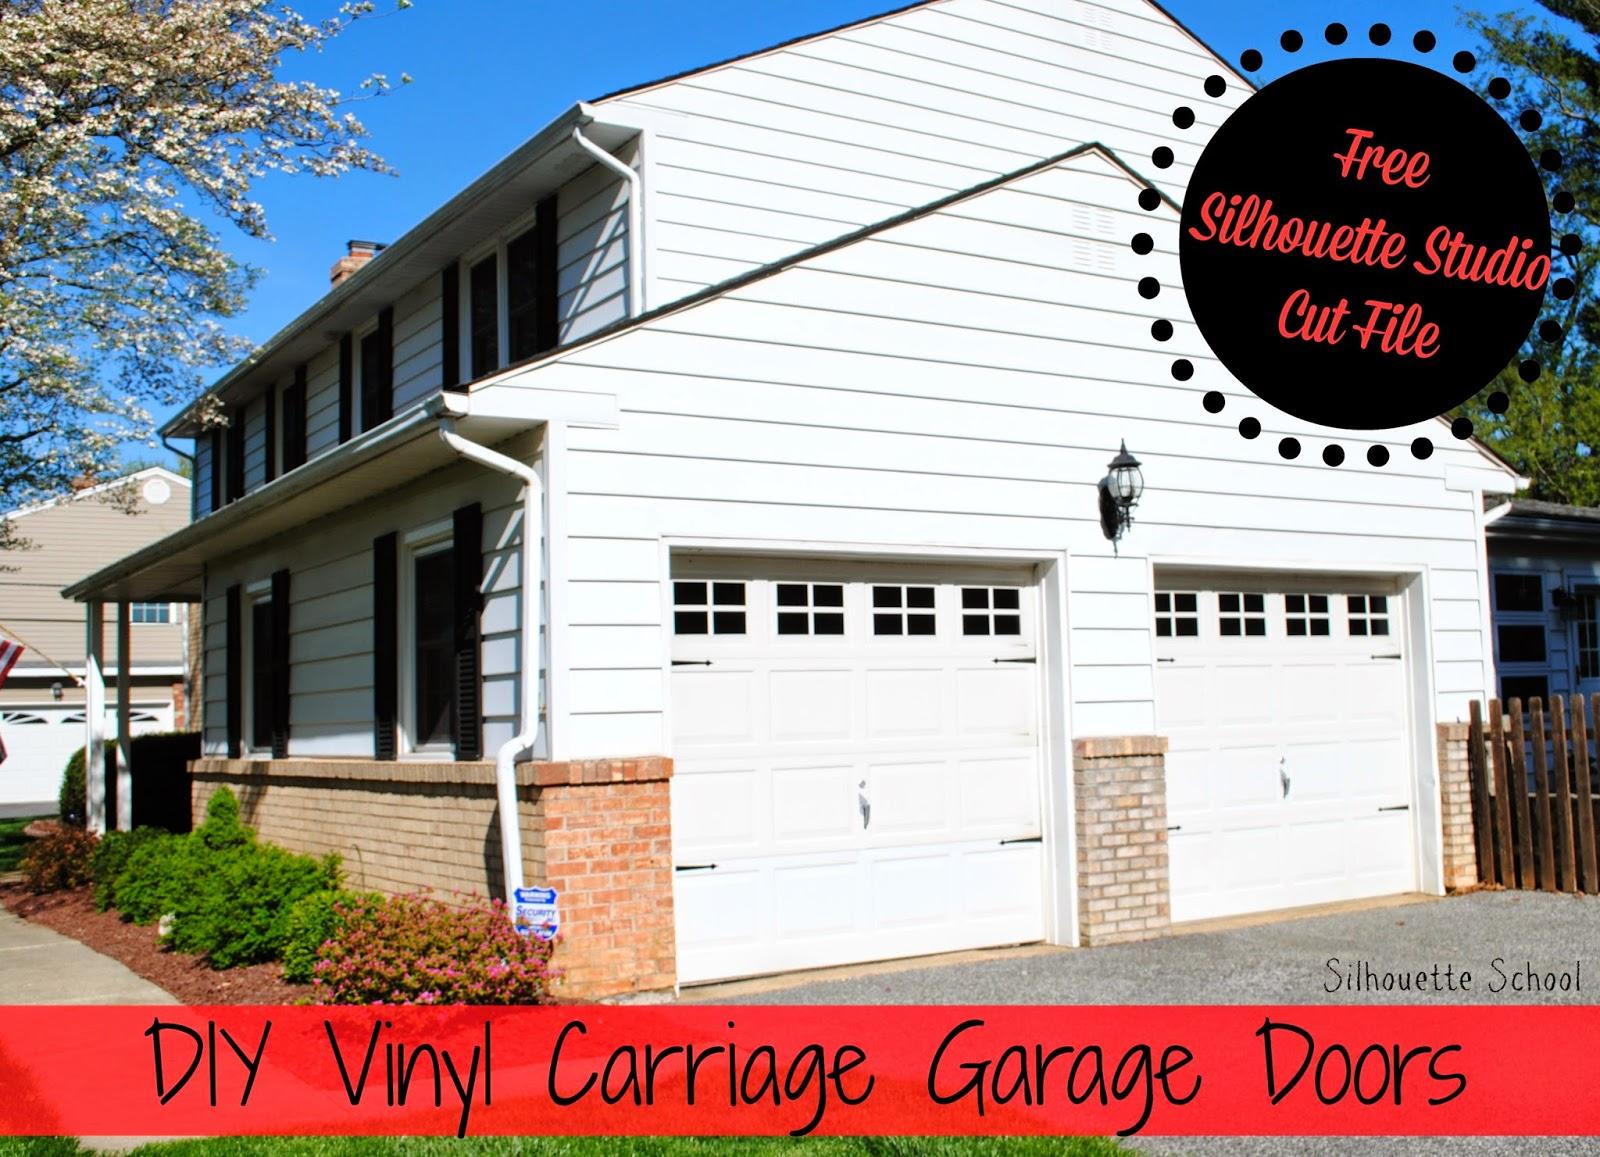 Diy vinyl faux carriage garage doors free studio file giveaway vinyl faux carriage garage doors diy do it yourself free solutioingenieria Image collections